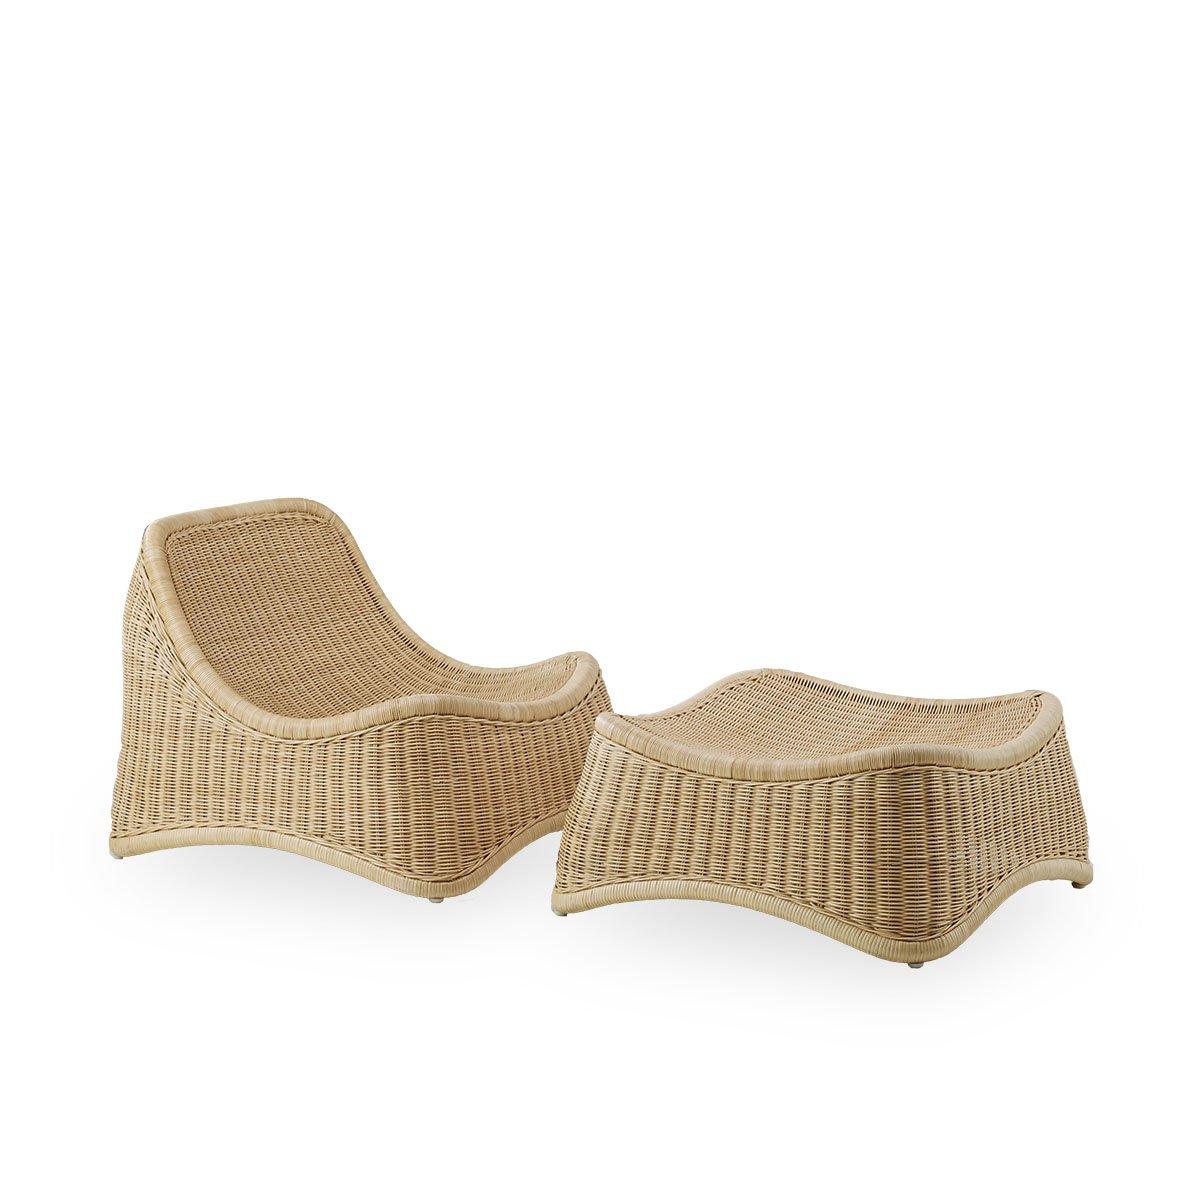 Sika Design Sessel Chill mit Hocker Natur